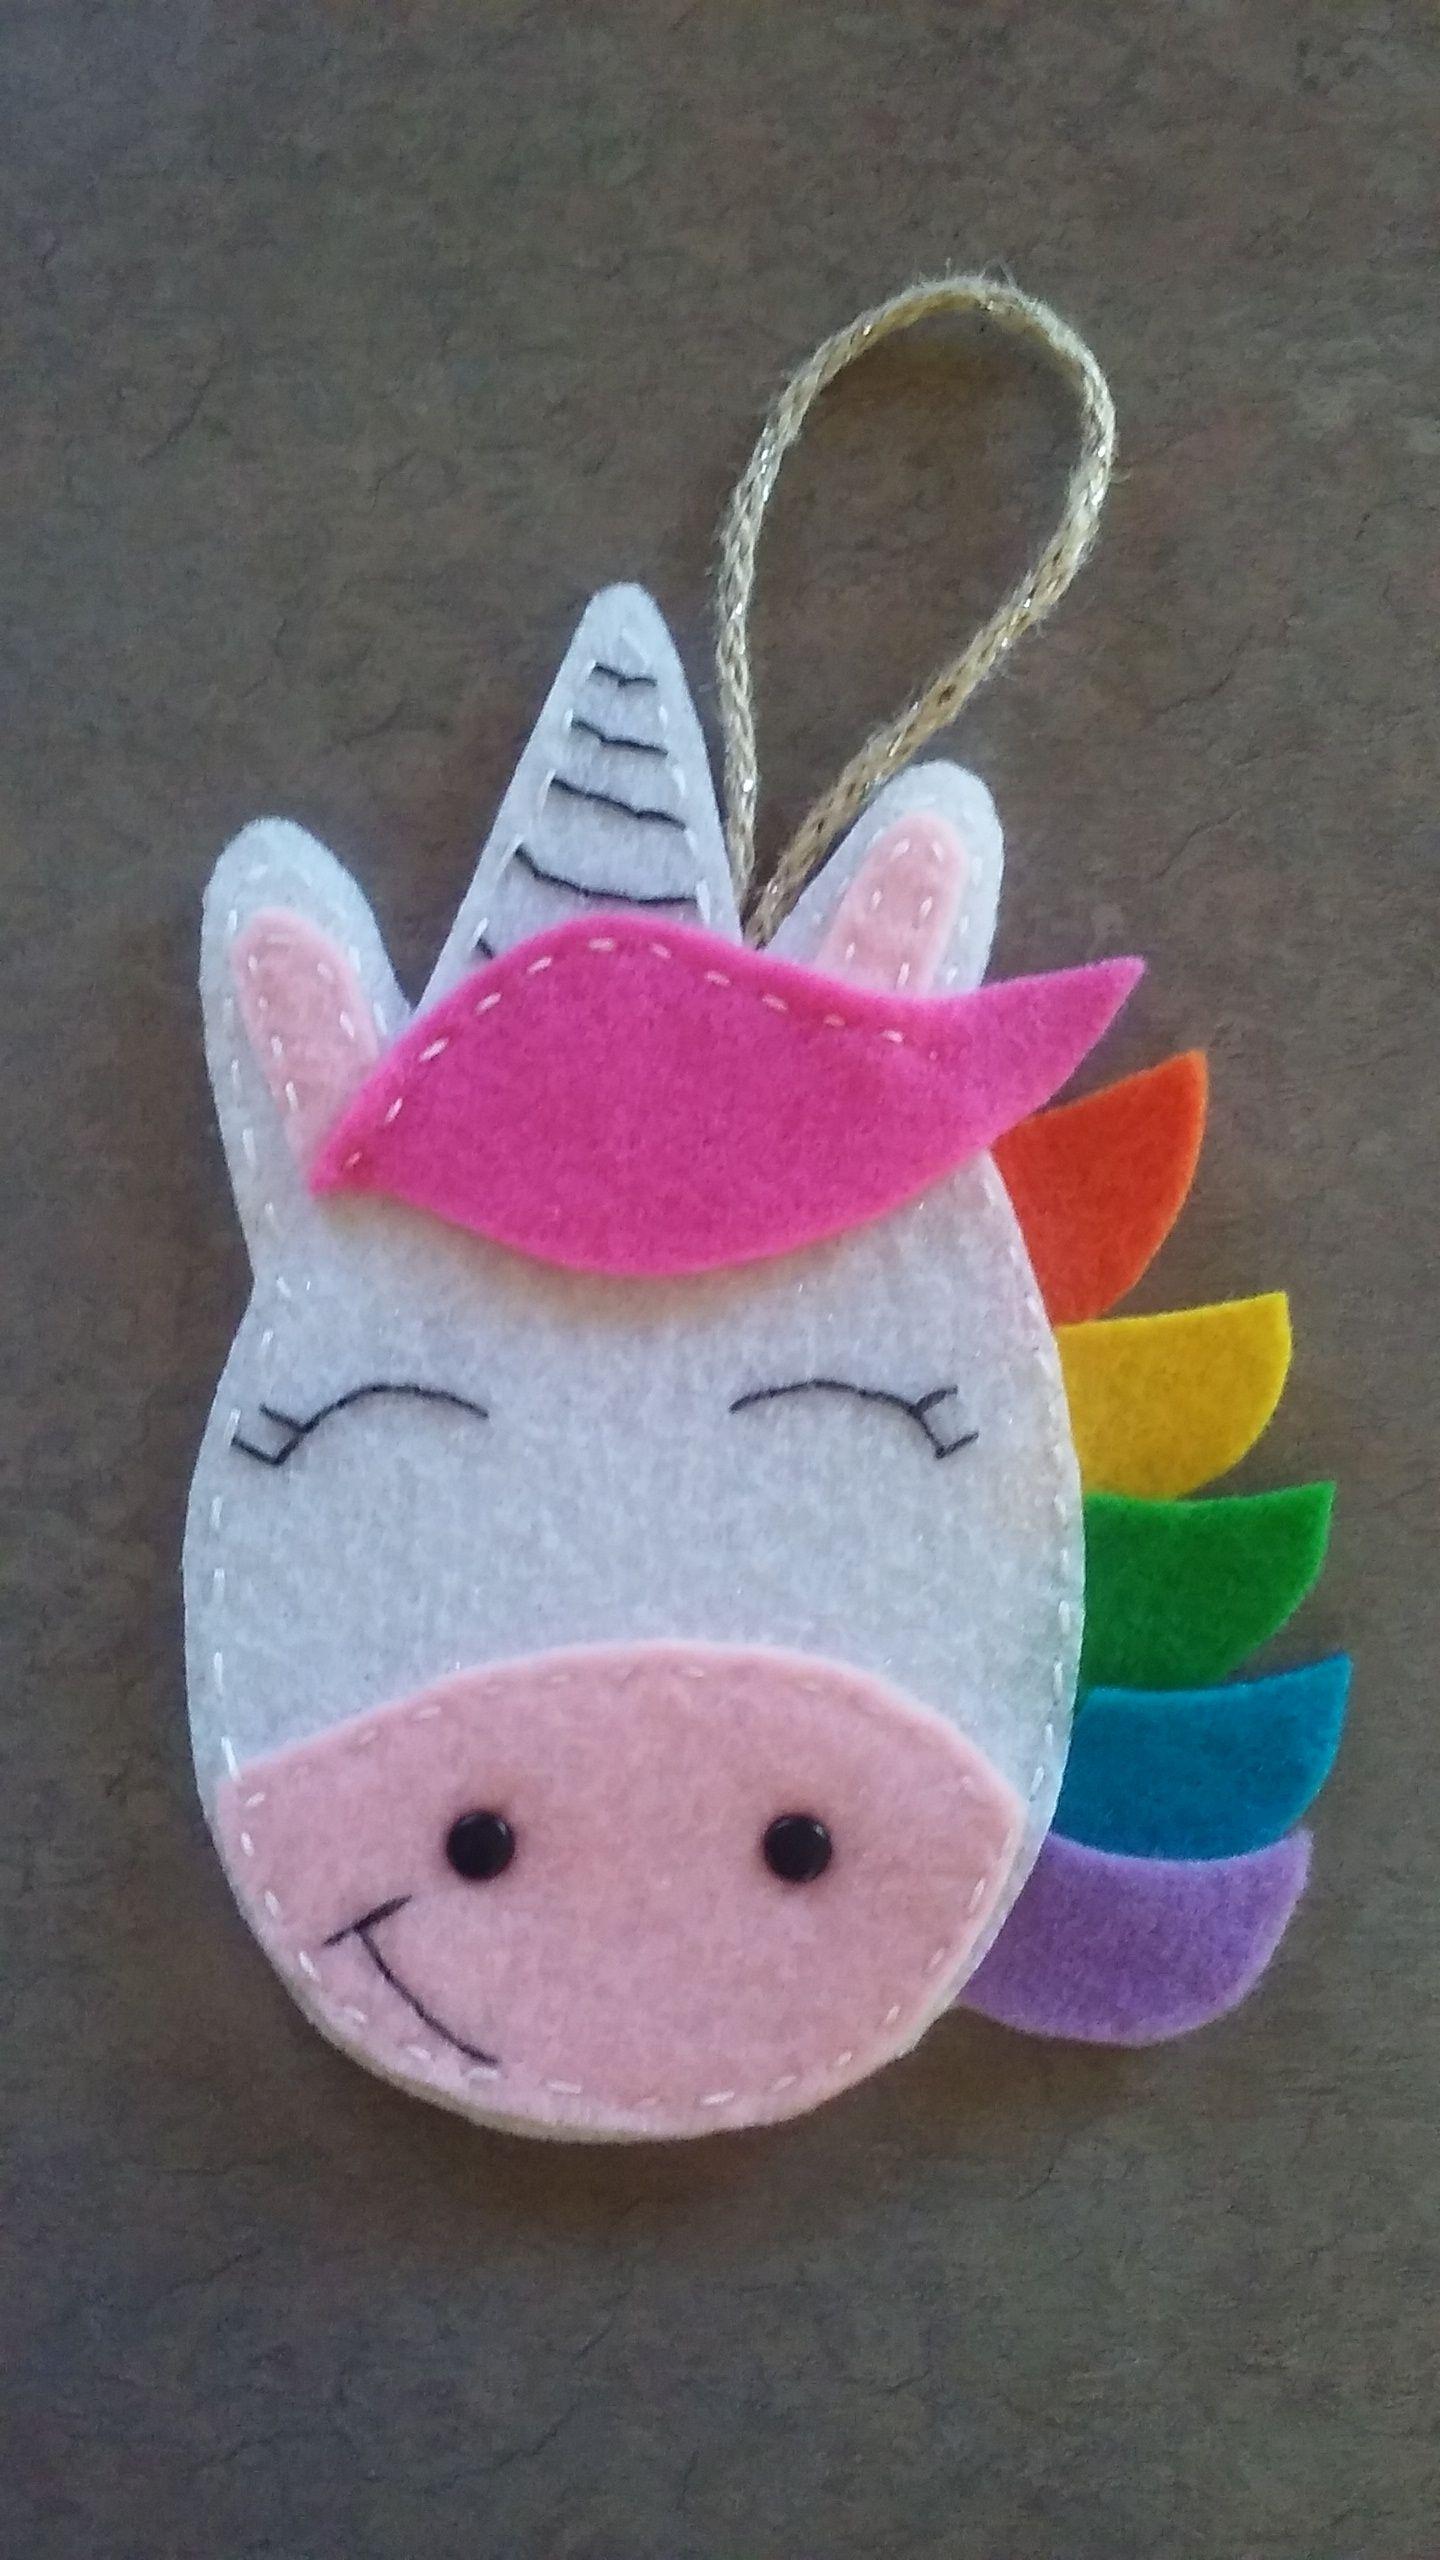 Felt Unicorn Ornament Rainbow Magic Handstitched Felt Crafts Diy Craft Projects For Kids Diy Christmas Ornaments Easy